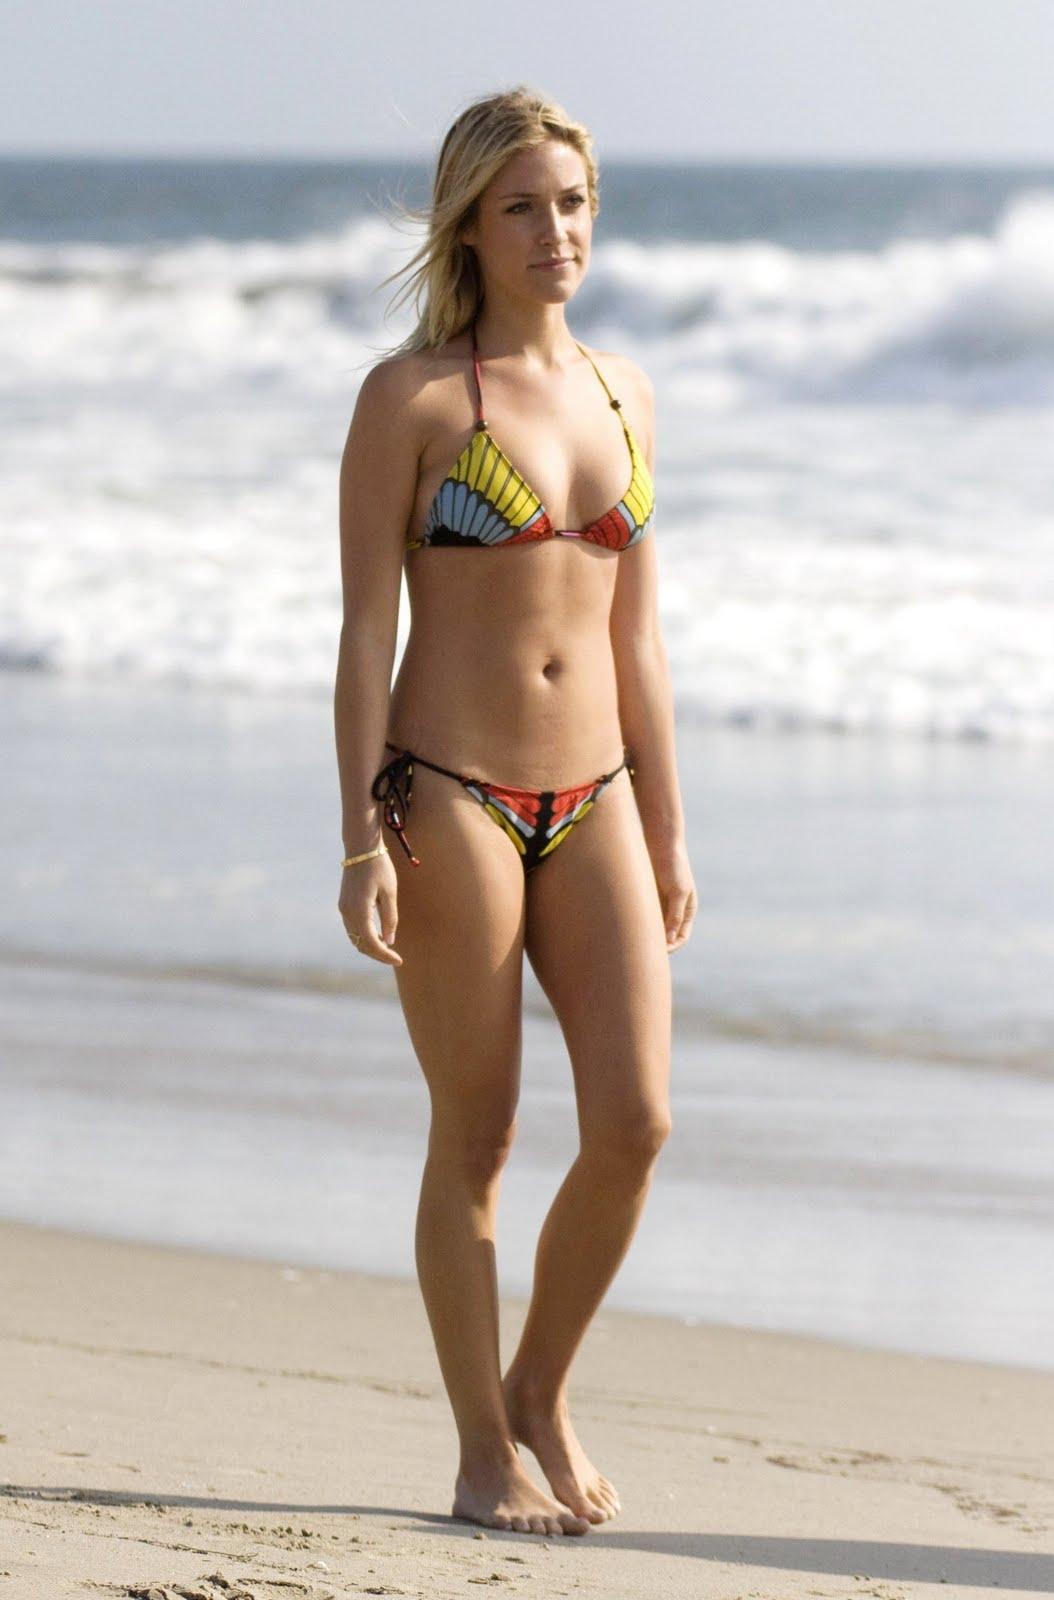 Kristin Cavallari Bikini Bodies Pic 24 of 35